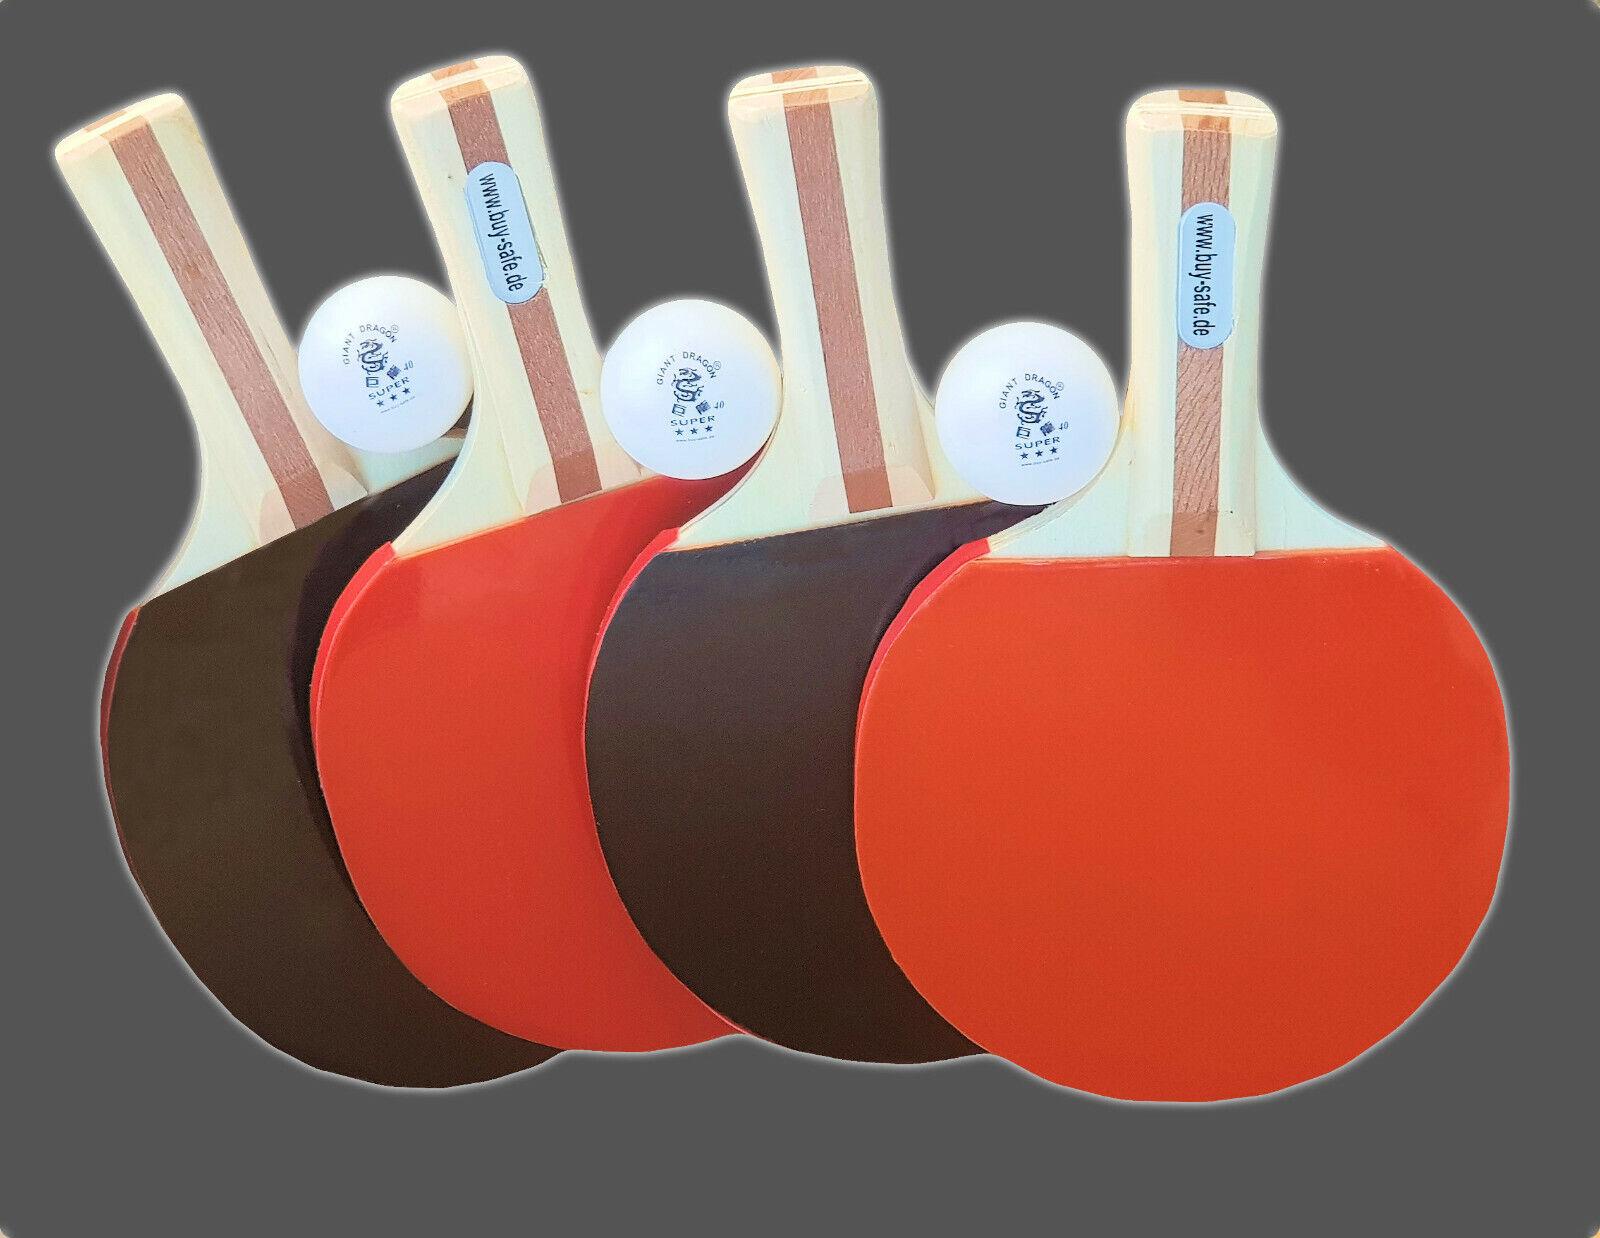 Tischtennis-Schläger-Set Tischtennis-Schläger-Set Tischtennis-Schläger-Set  Schläger + Bälle in 3 Sterne- Qualität e44e1a